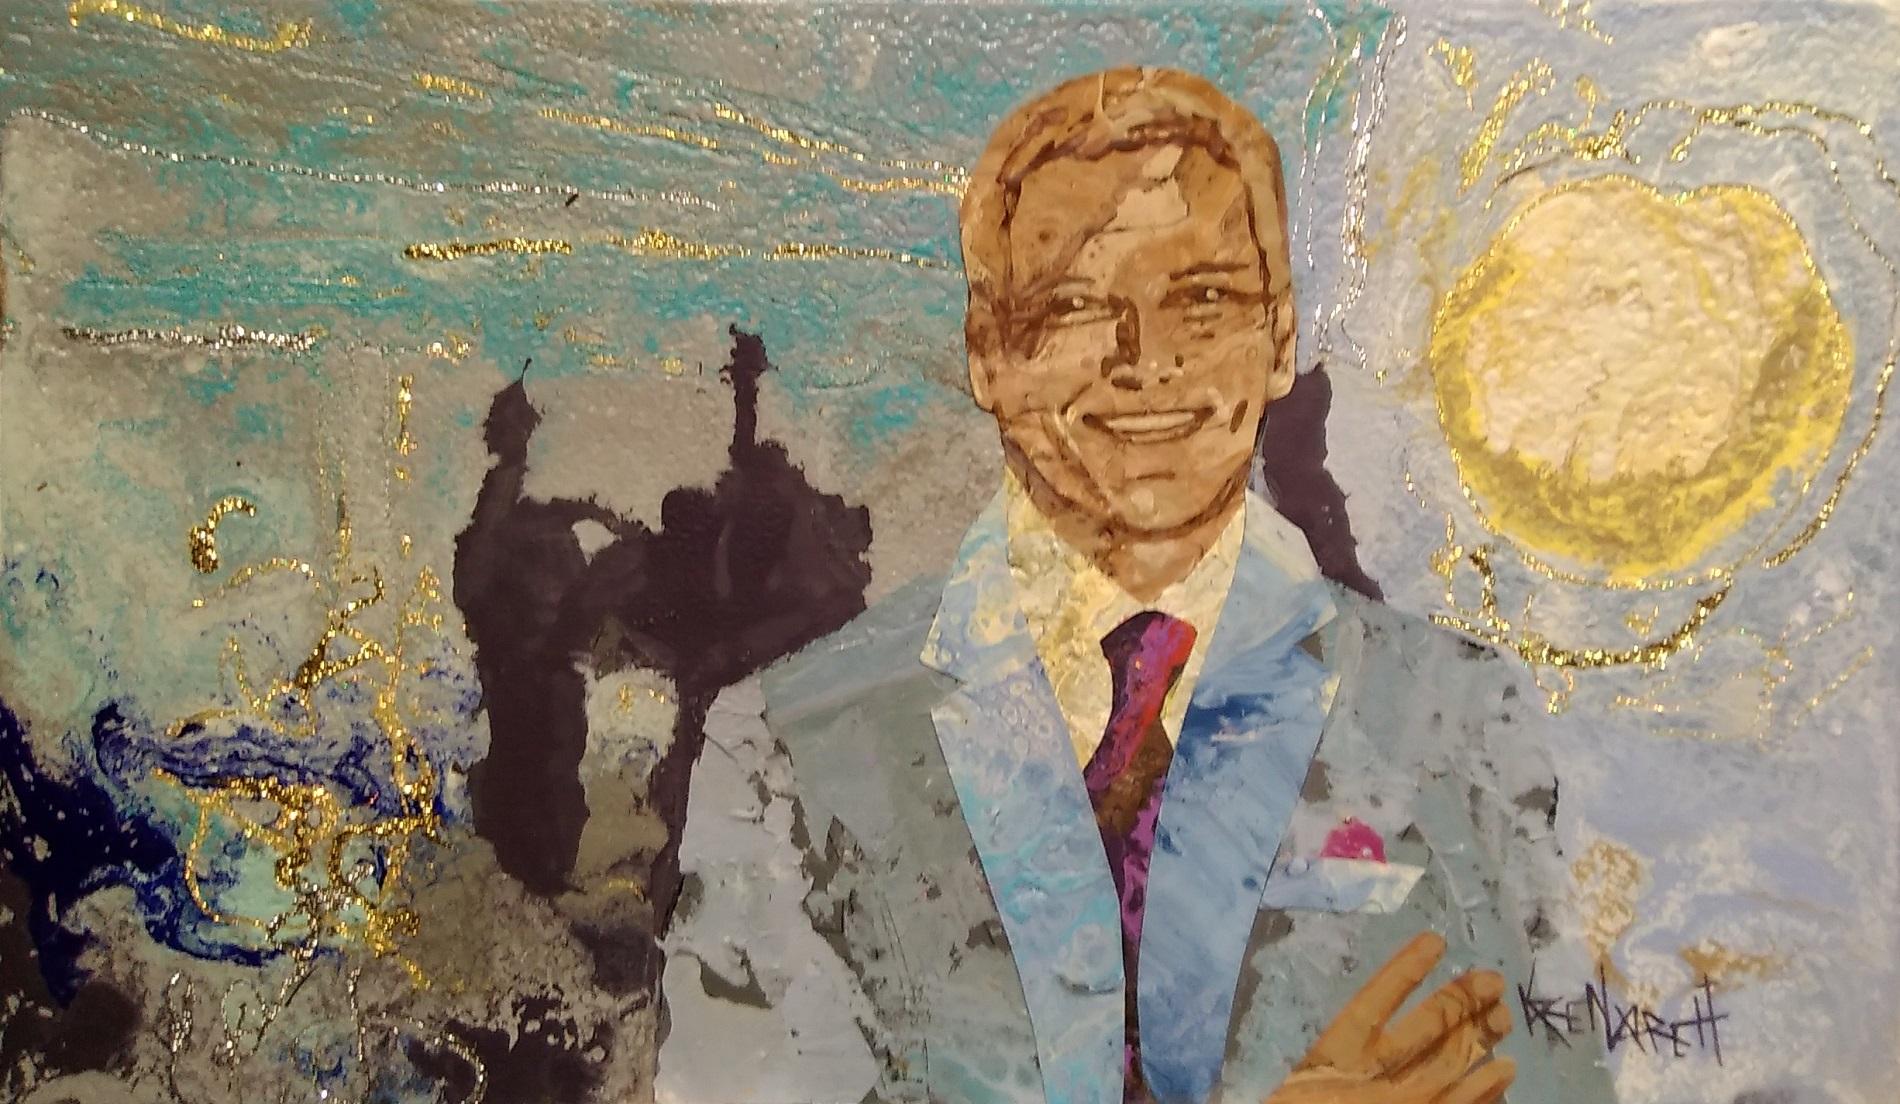 karen_garrett_flat_sculpture_caeser_solomon_hollein_portrait_$850